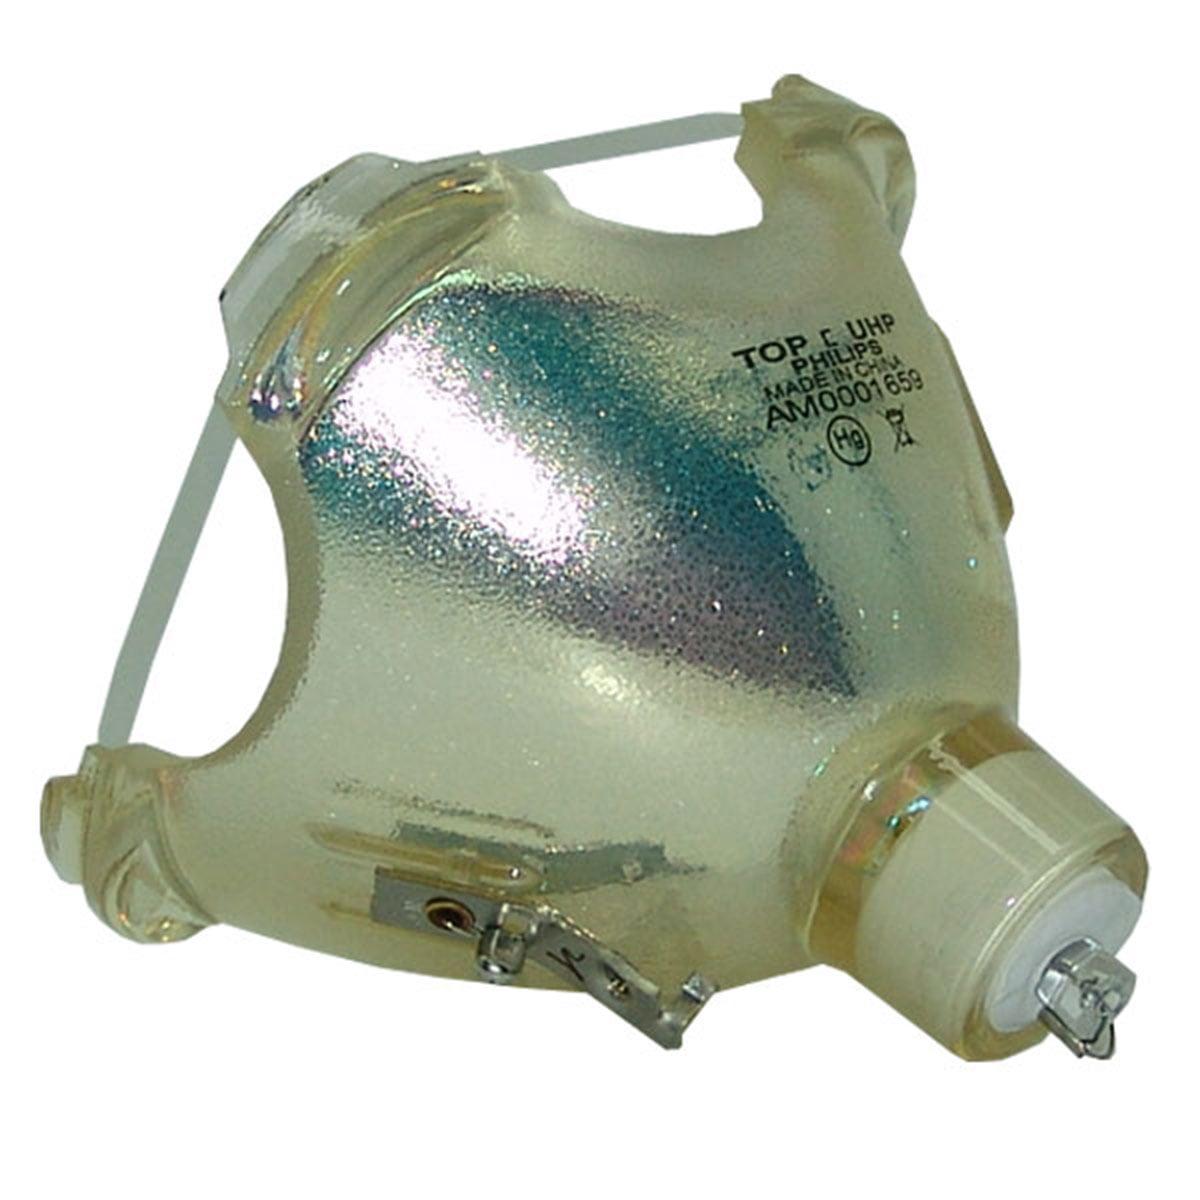 Lutema Platinum for Epson PowerLite 500 Projector Lamp (Original Philips Bulb) - image 1 of 5